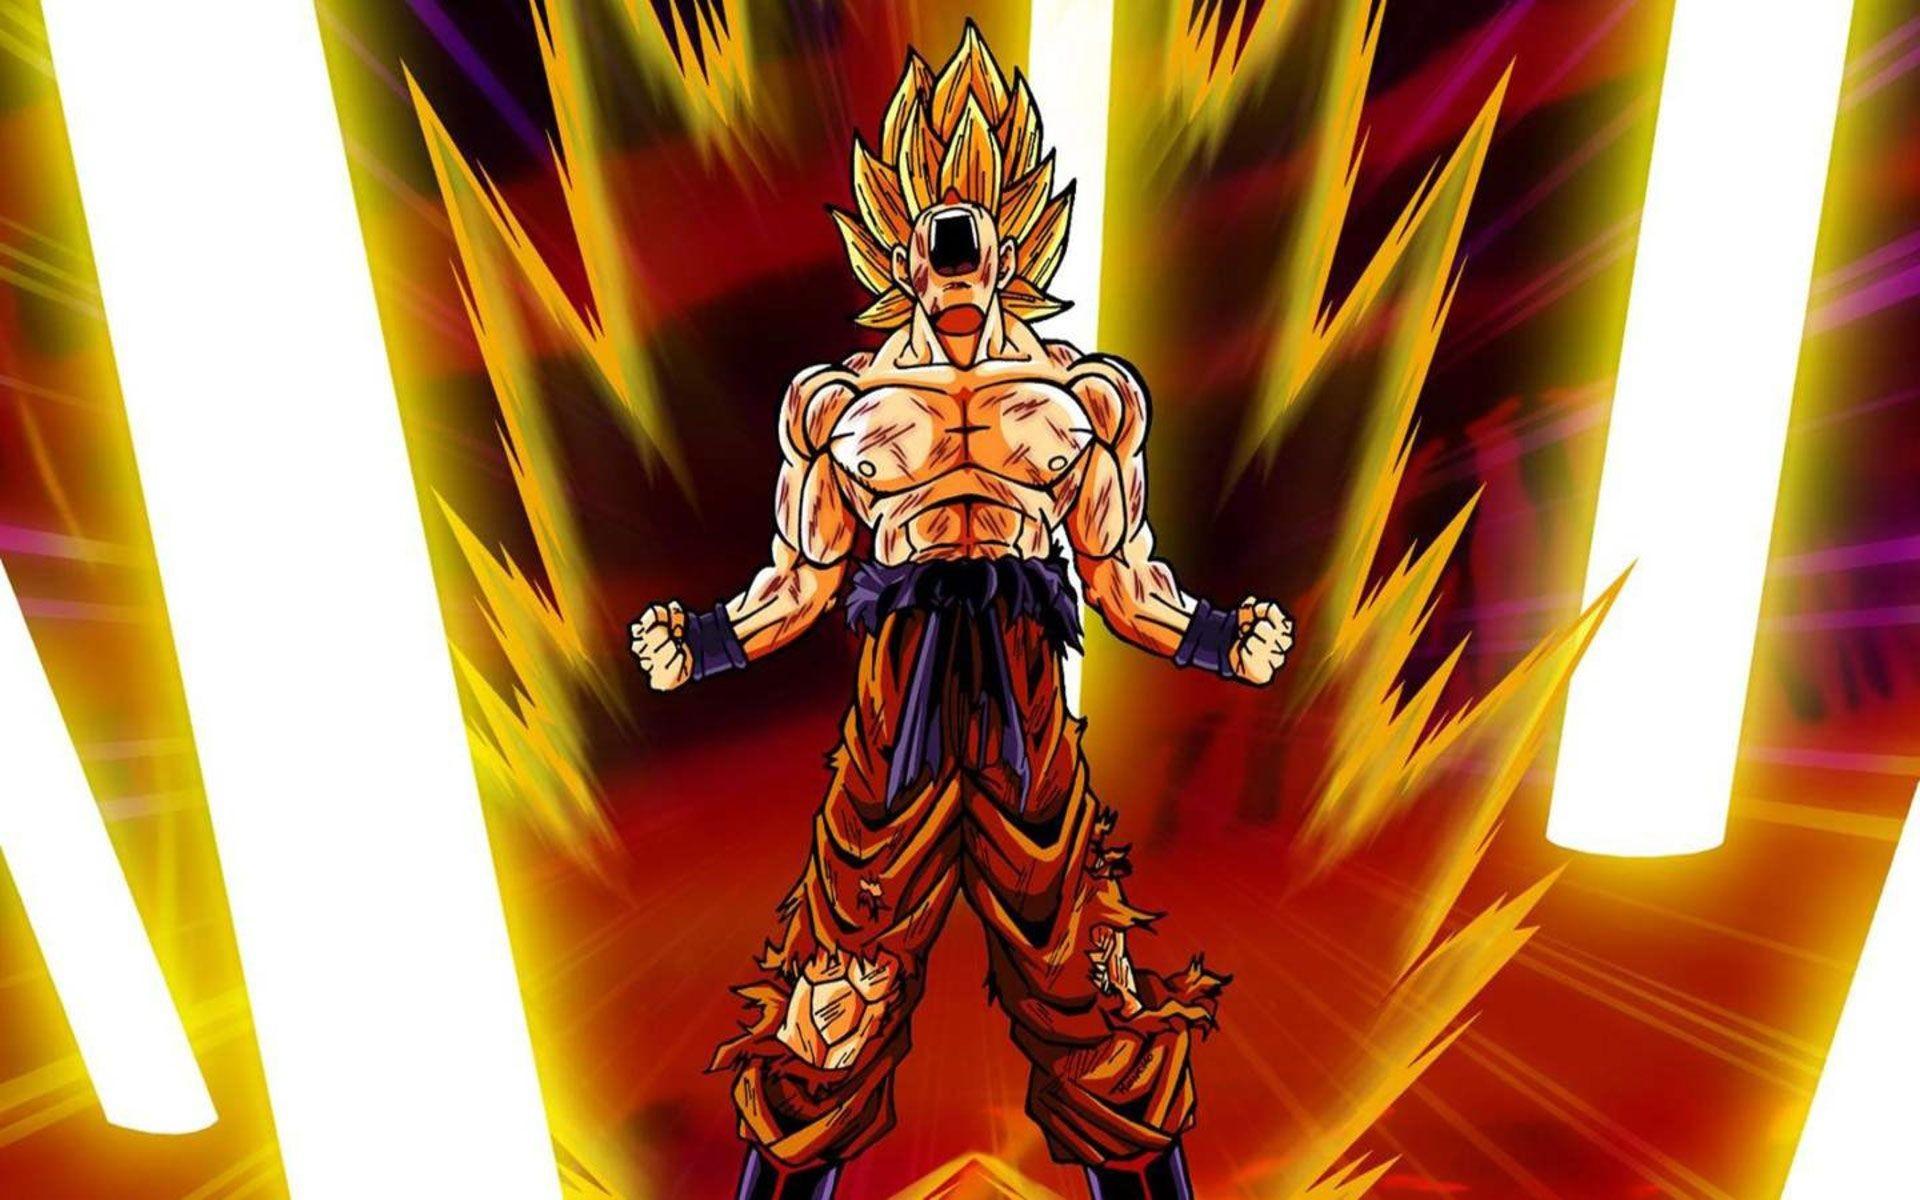 Dragon Ball Z Goku Super Saiyan Wallpaper – 131870